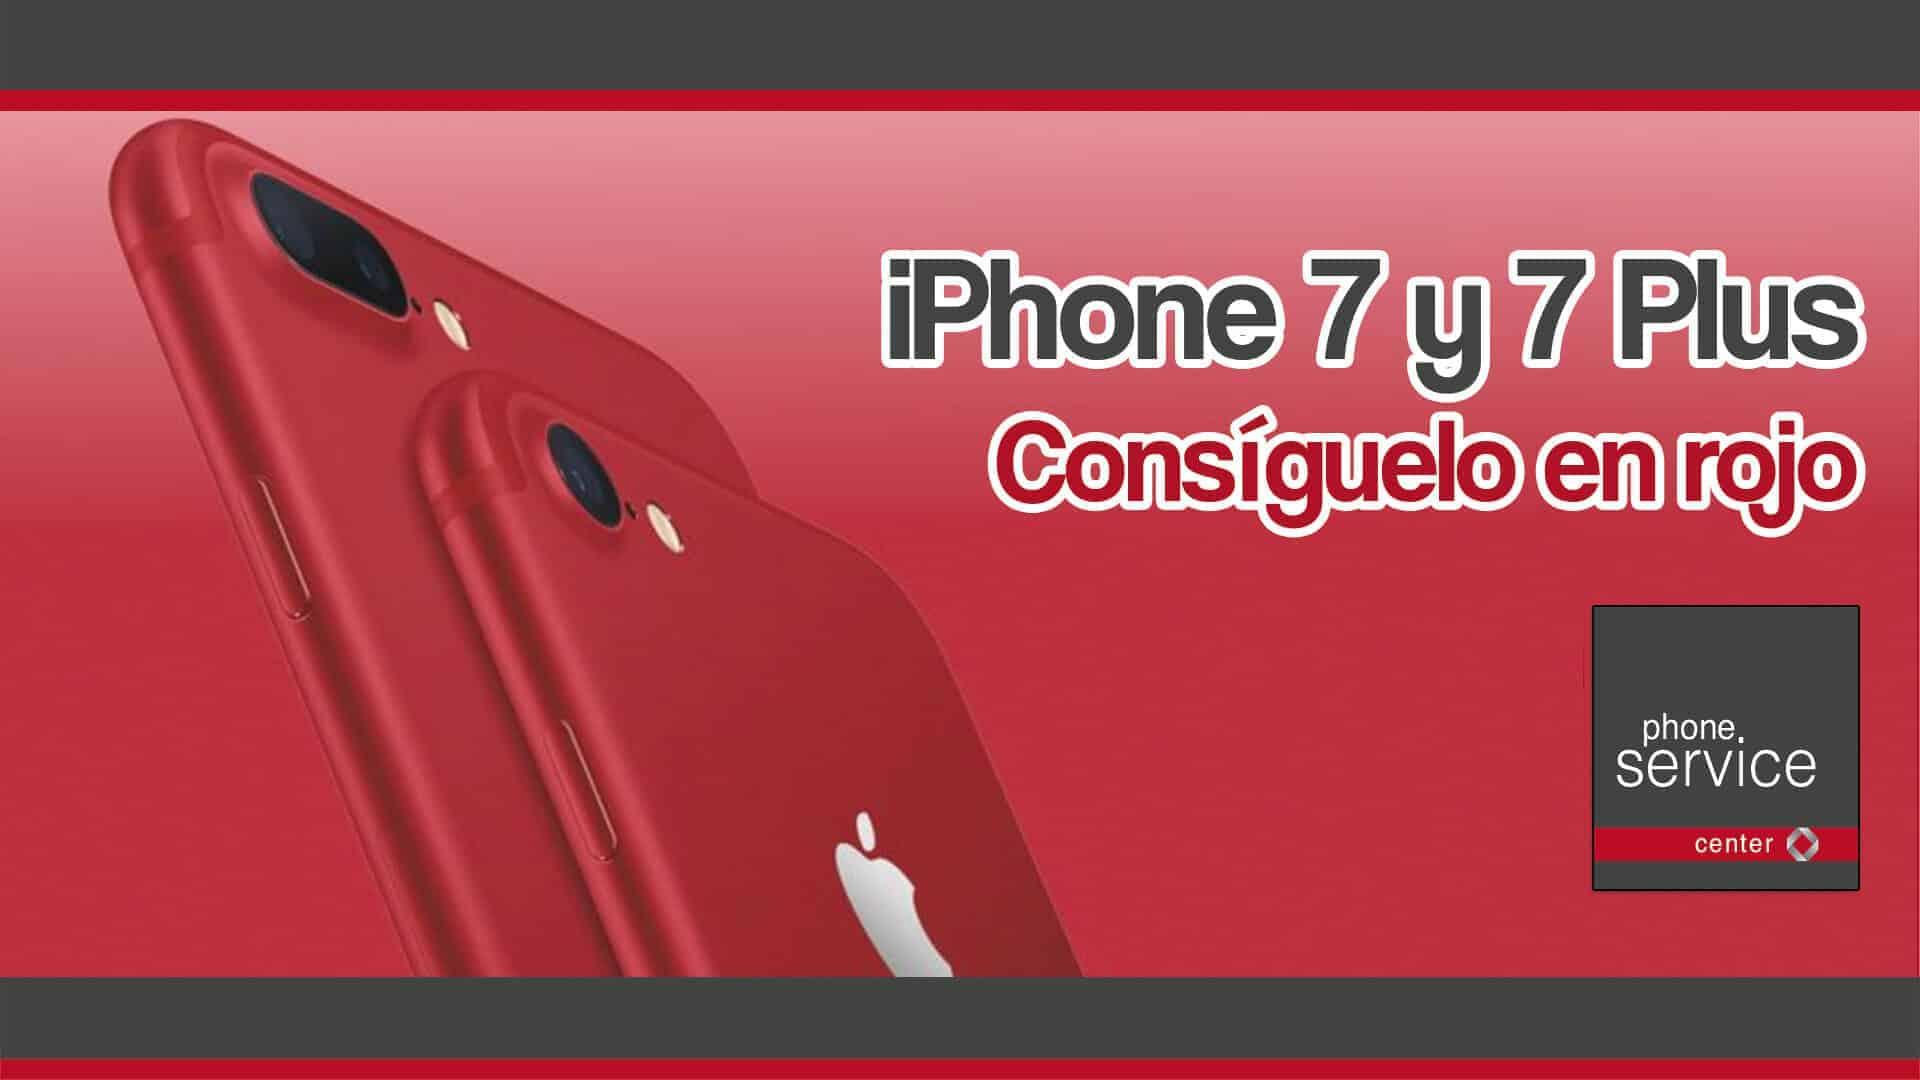 iPhone7y7Plusenrojo